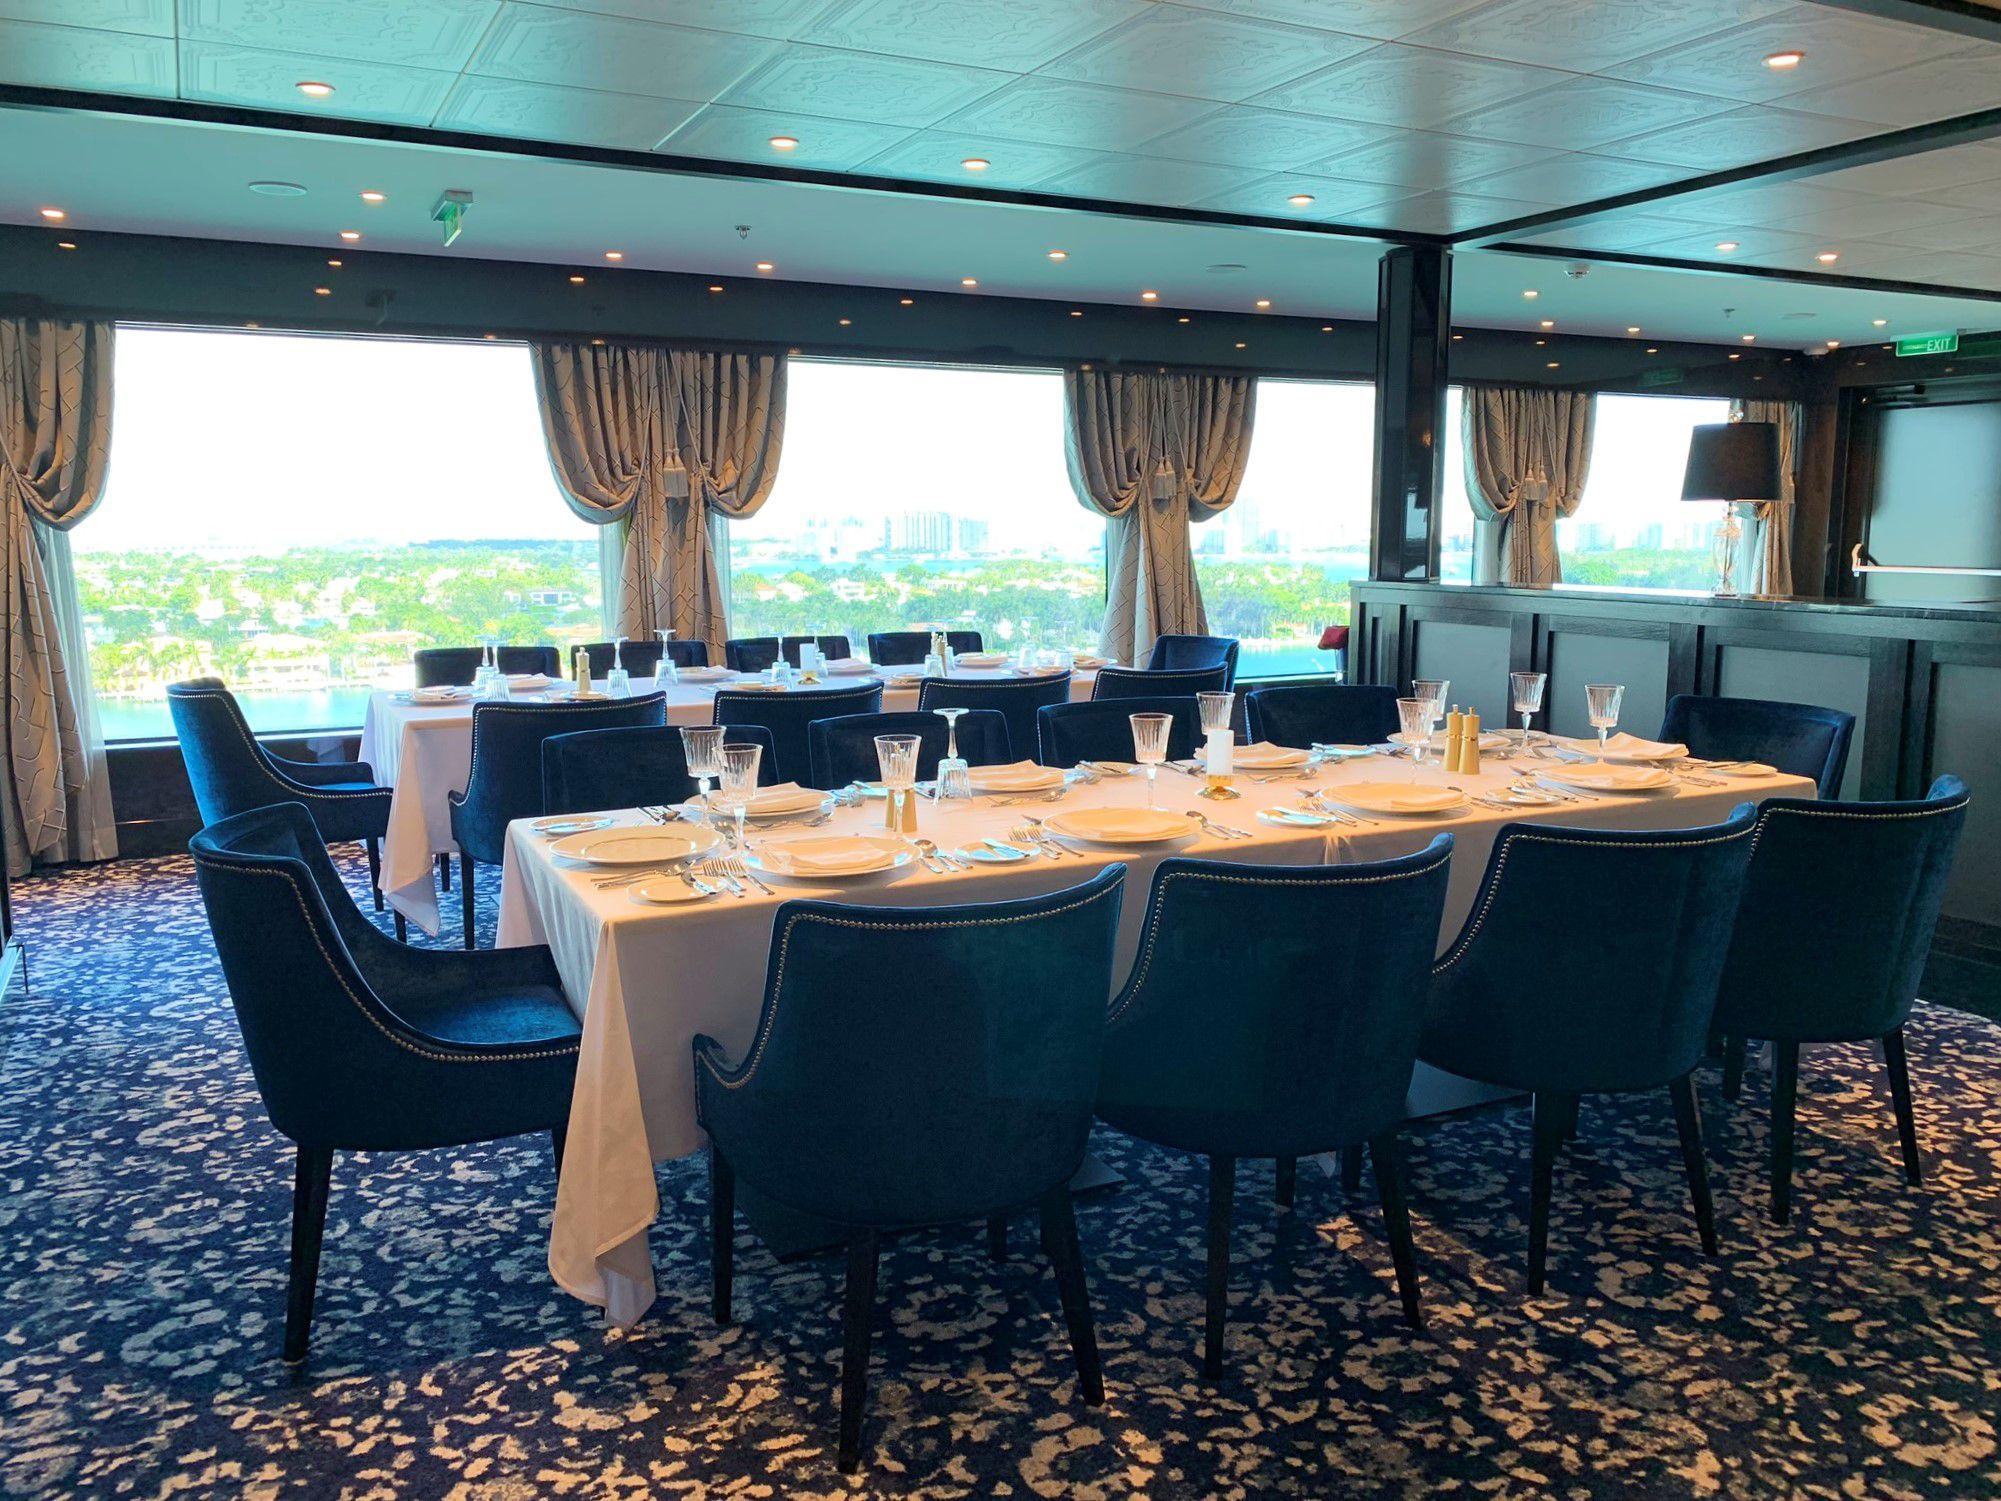 Norwegian Encore Restaurant Menus and Dining Guide